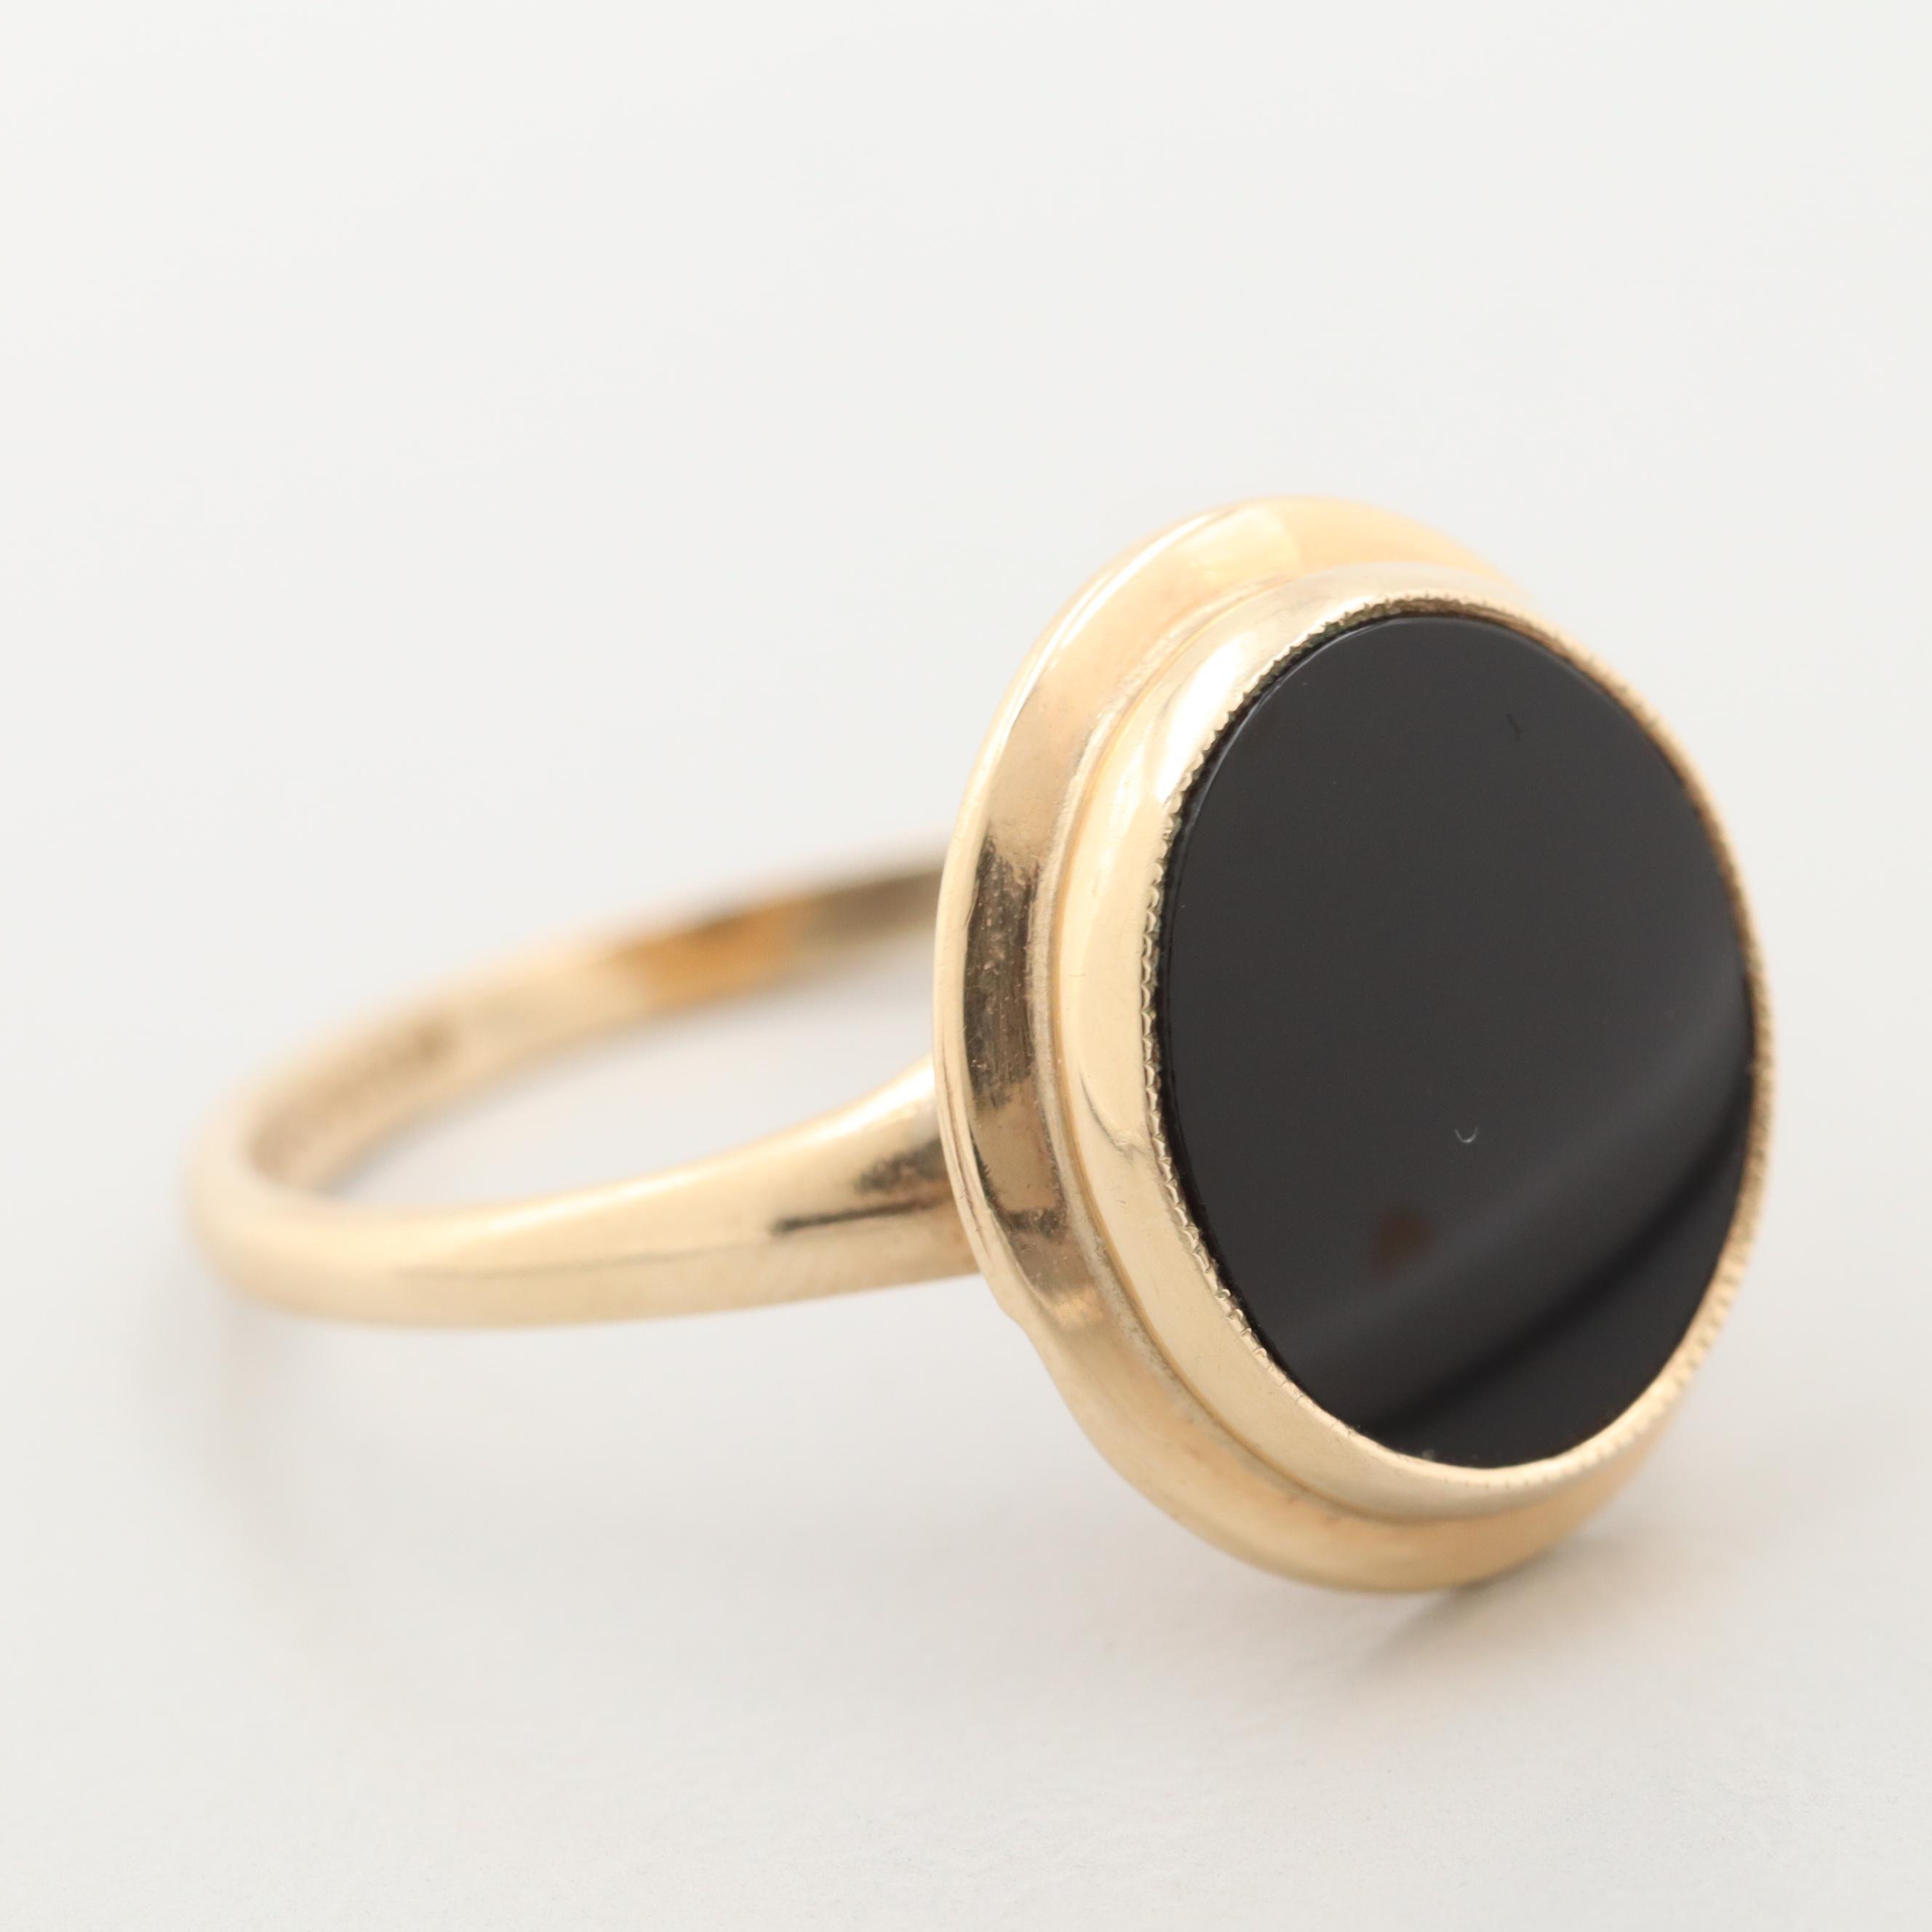 Vintage 10K Yellow Gold Black Onyx Ring